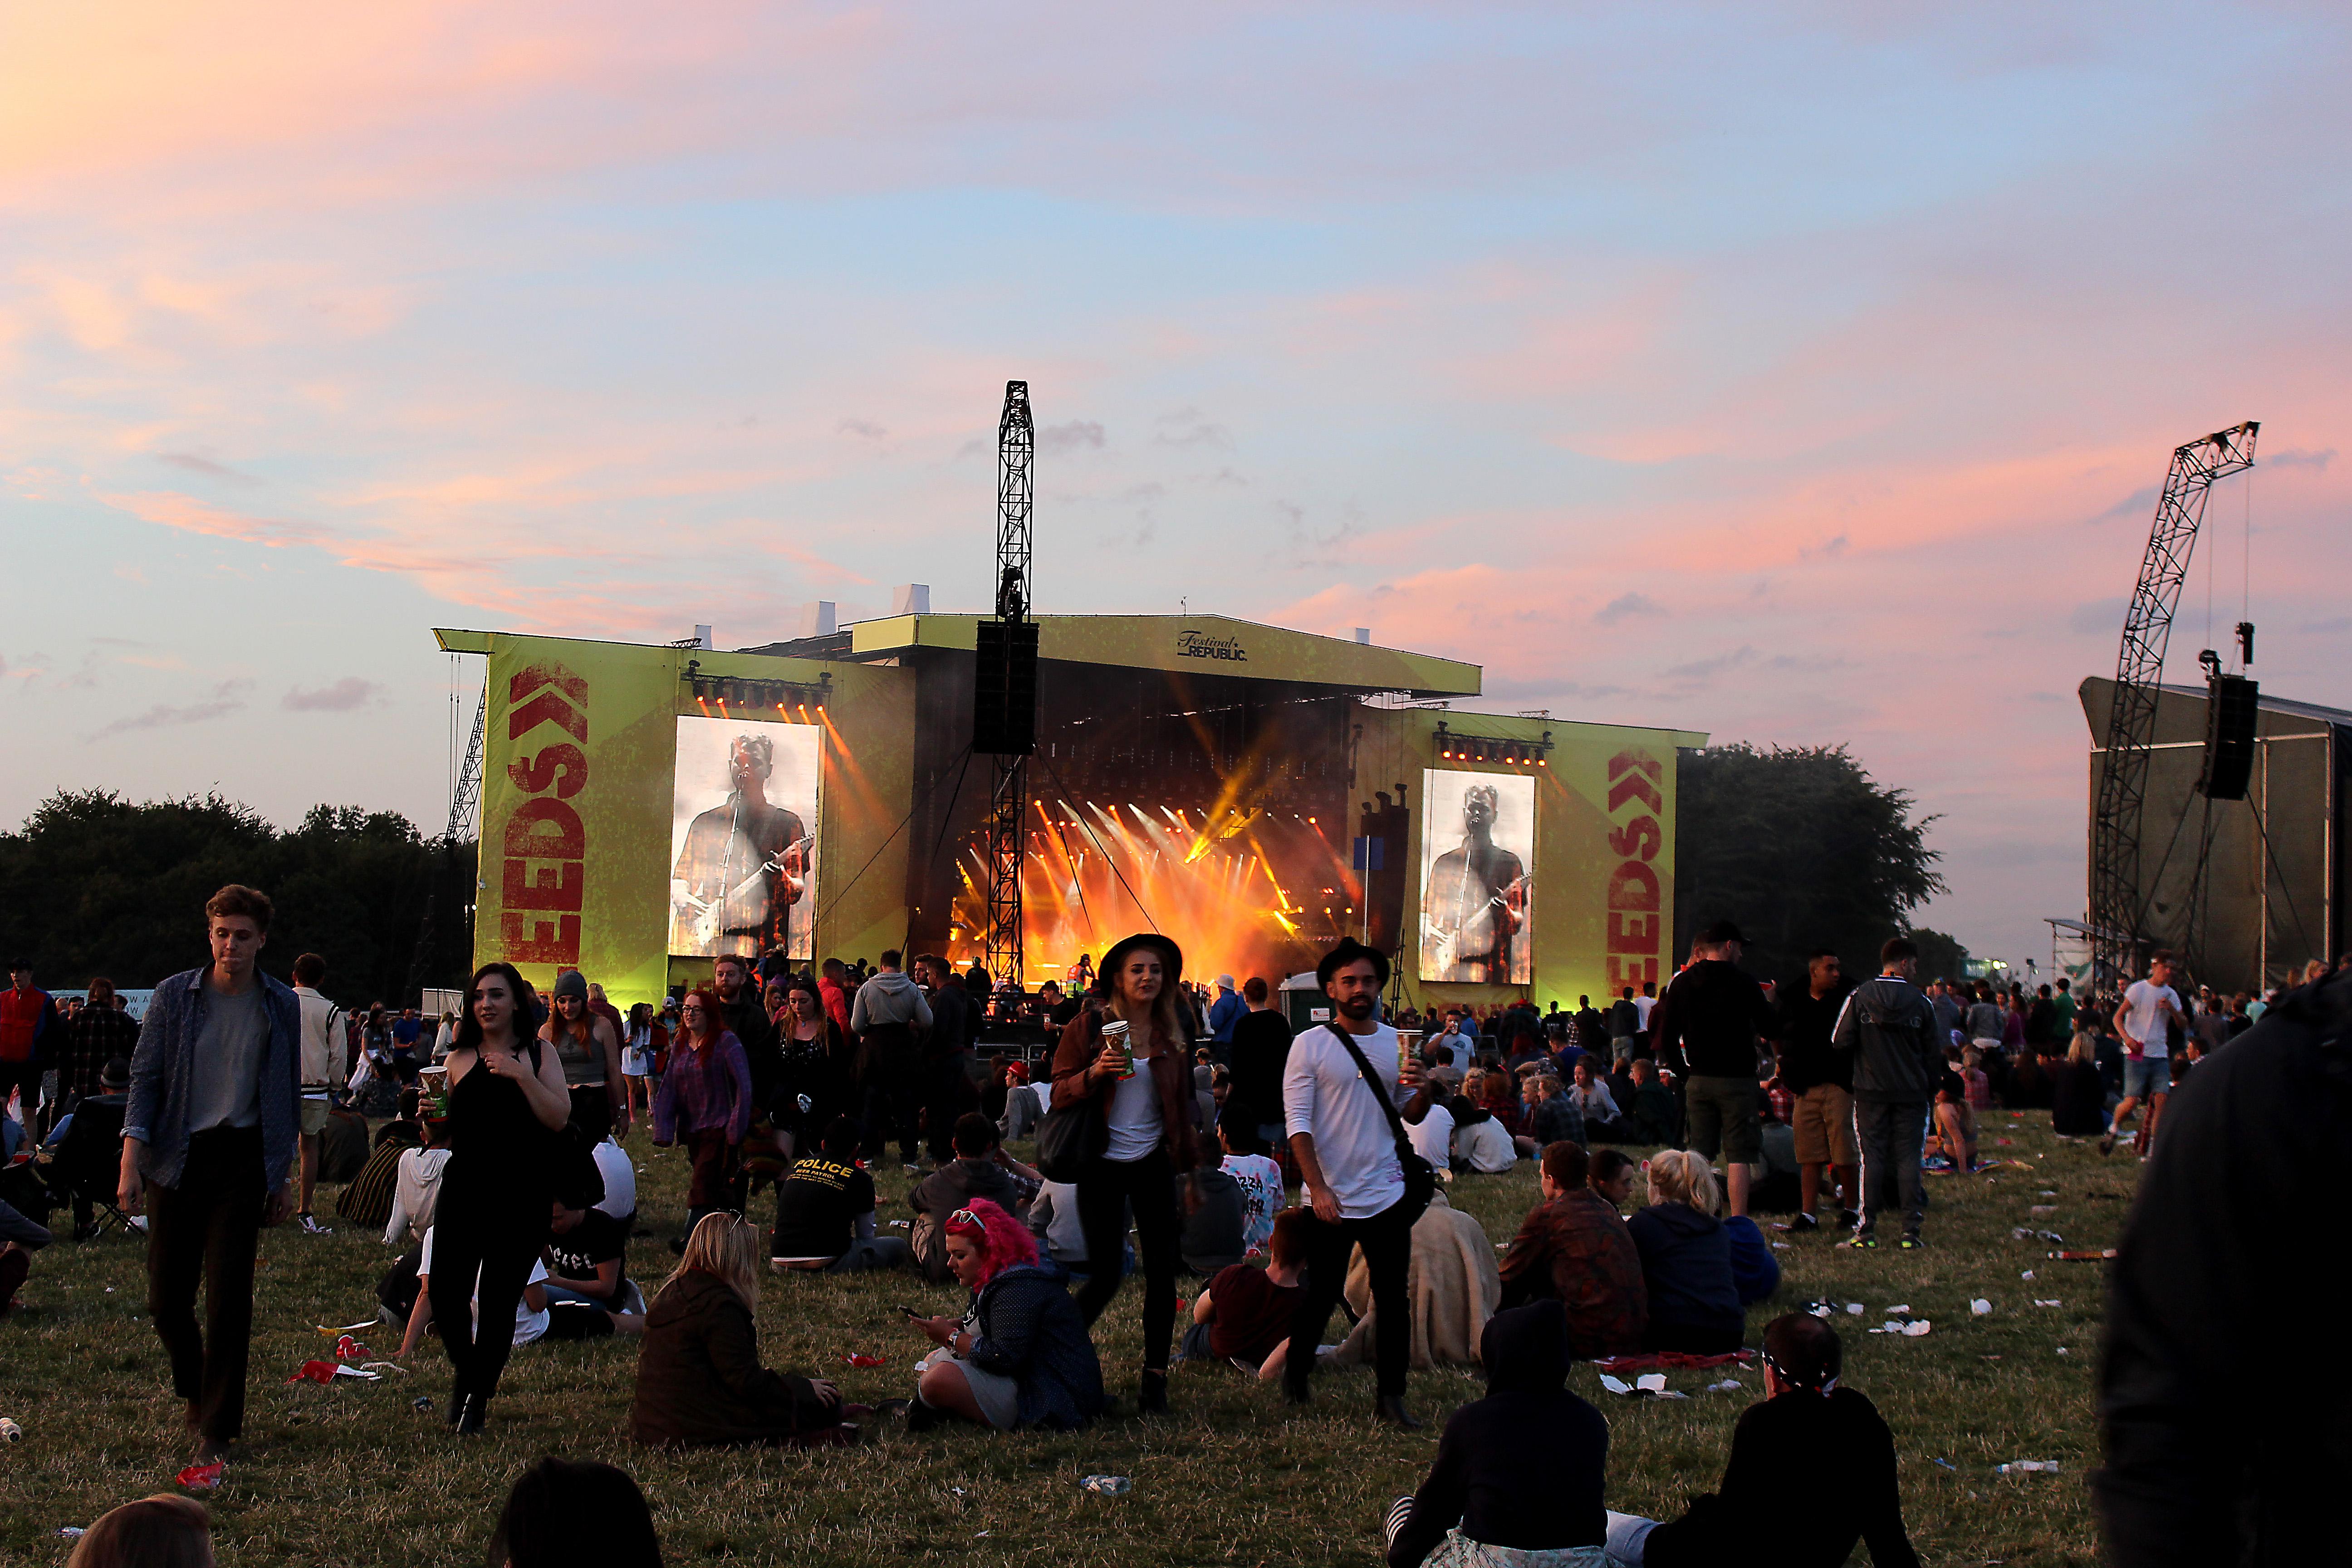 Leeds Festival 2013 bwin belgie | Photos | Boudist